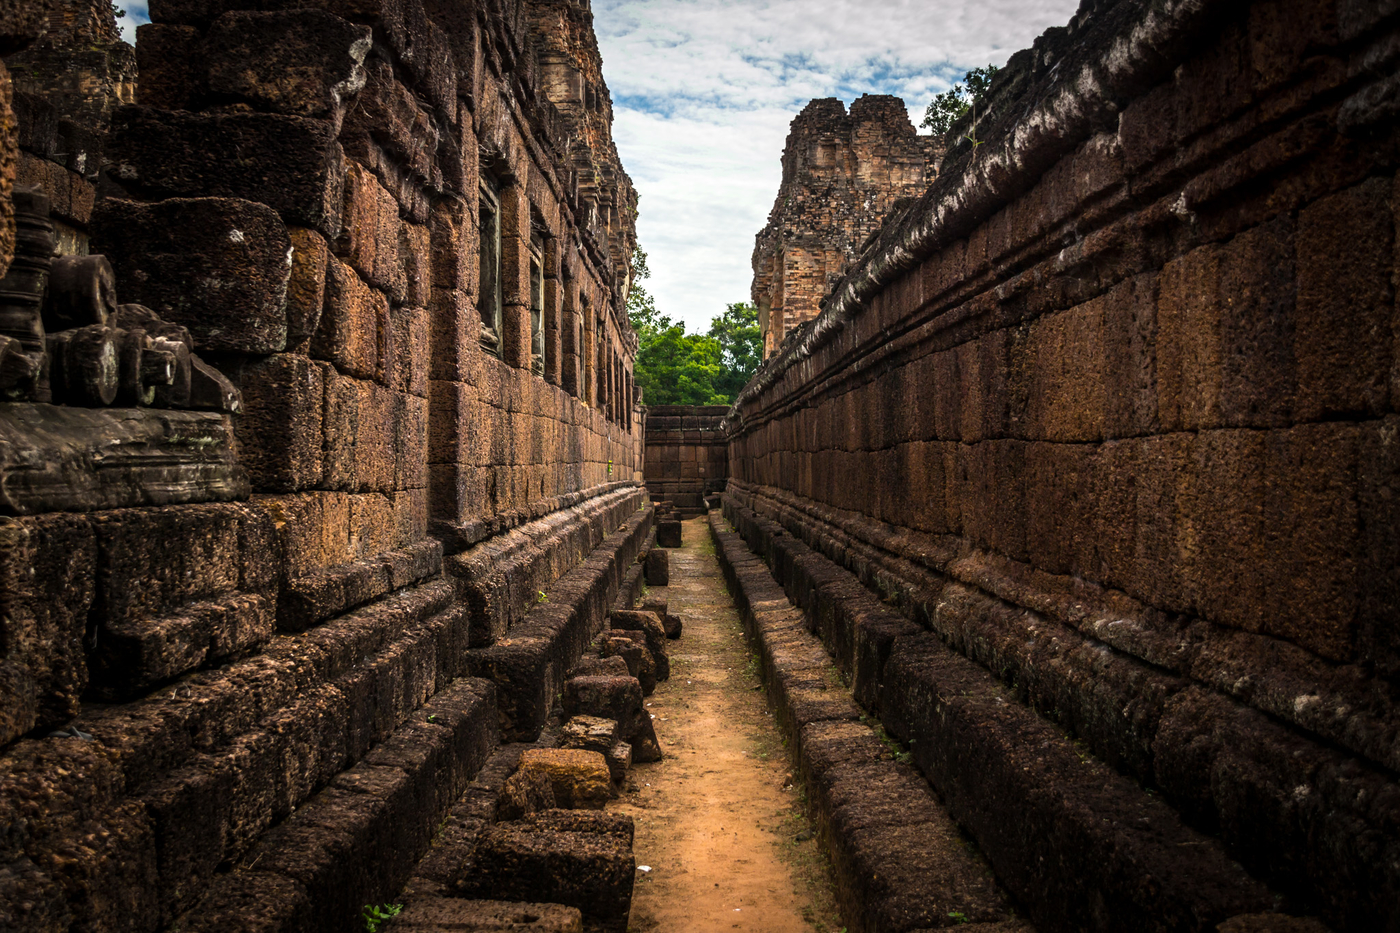 Bayon-Angkor-Thomjpg.jpg